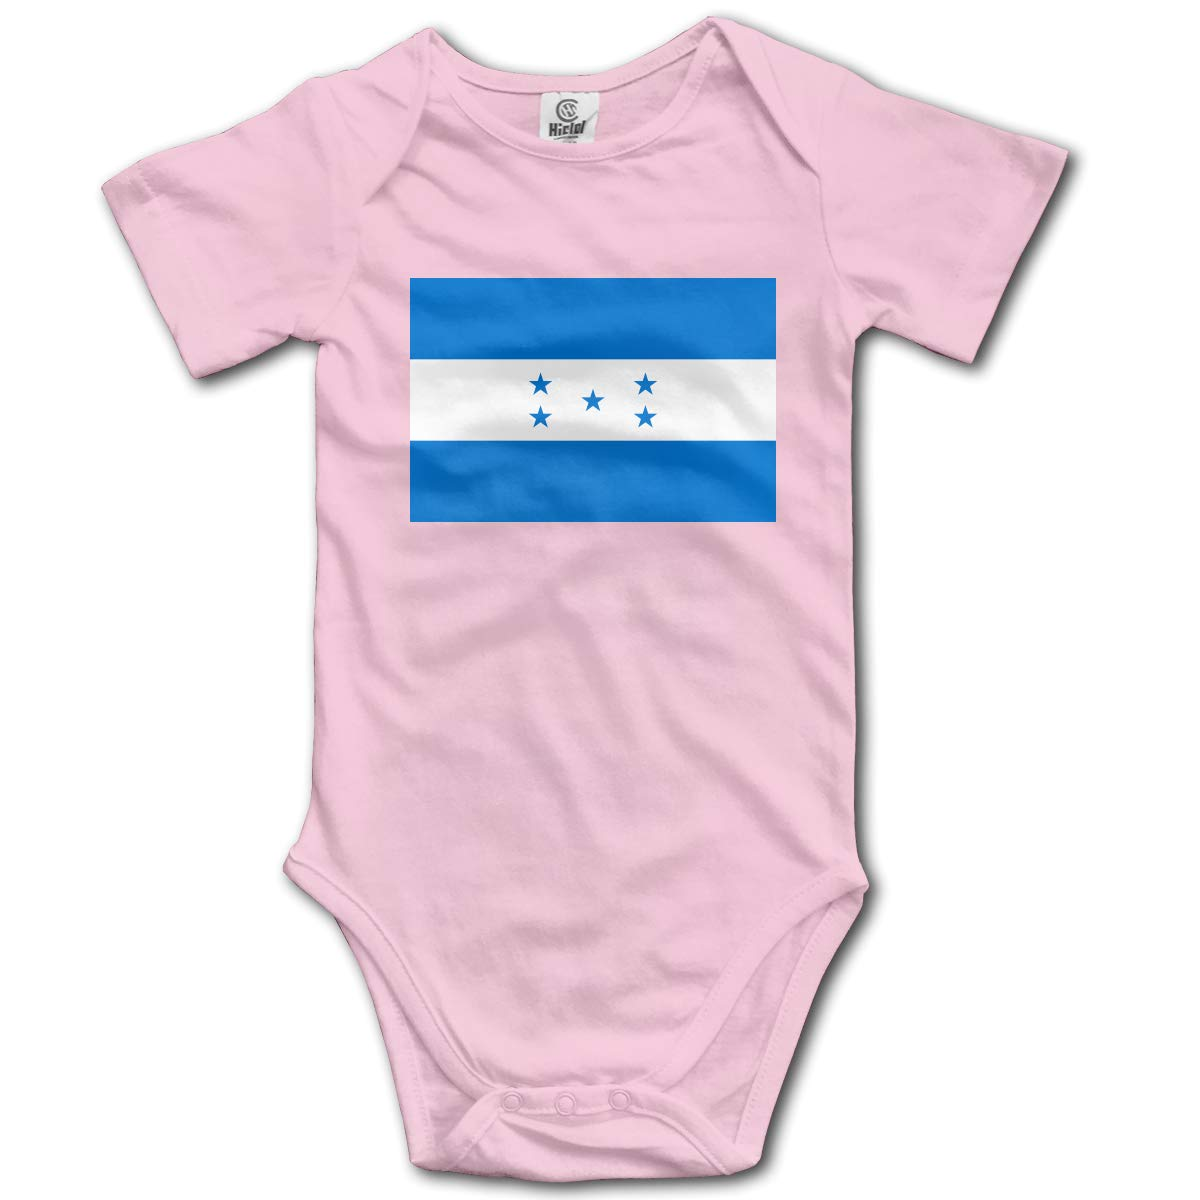 CUTEDWARF Baby Short-Sleeve Onesies Honduras Flag Bodysuit Baby Outfits